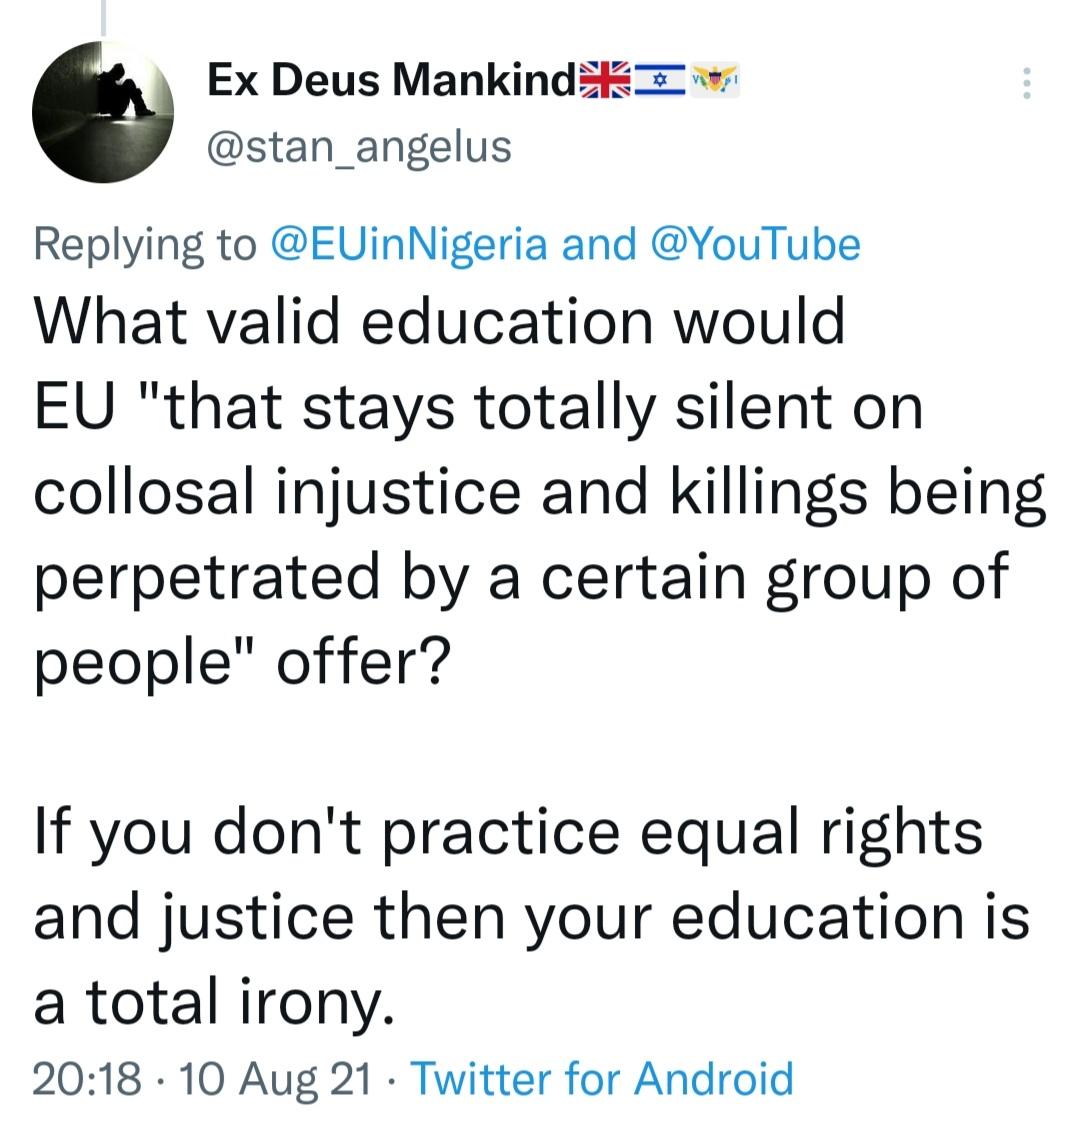 Reaction to EU's tweet